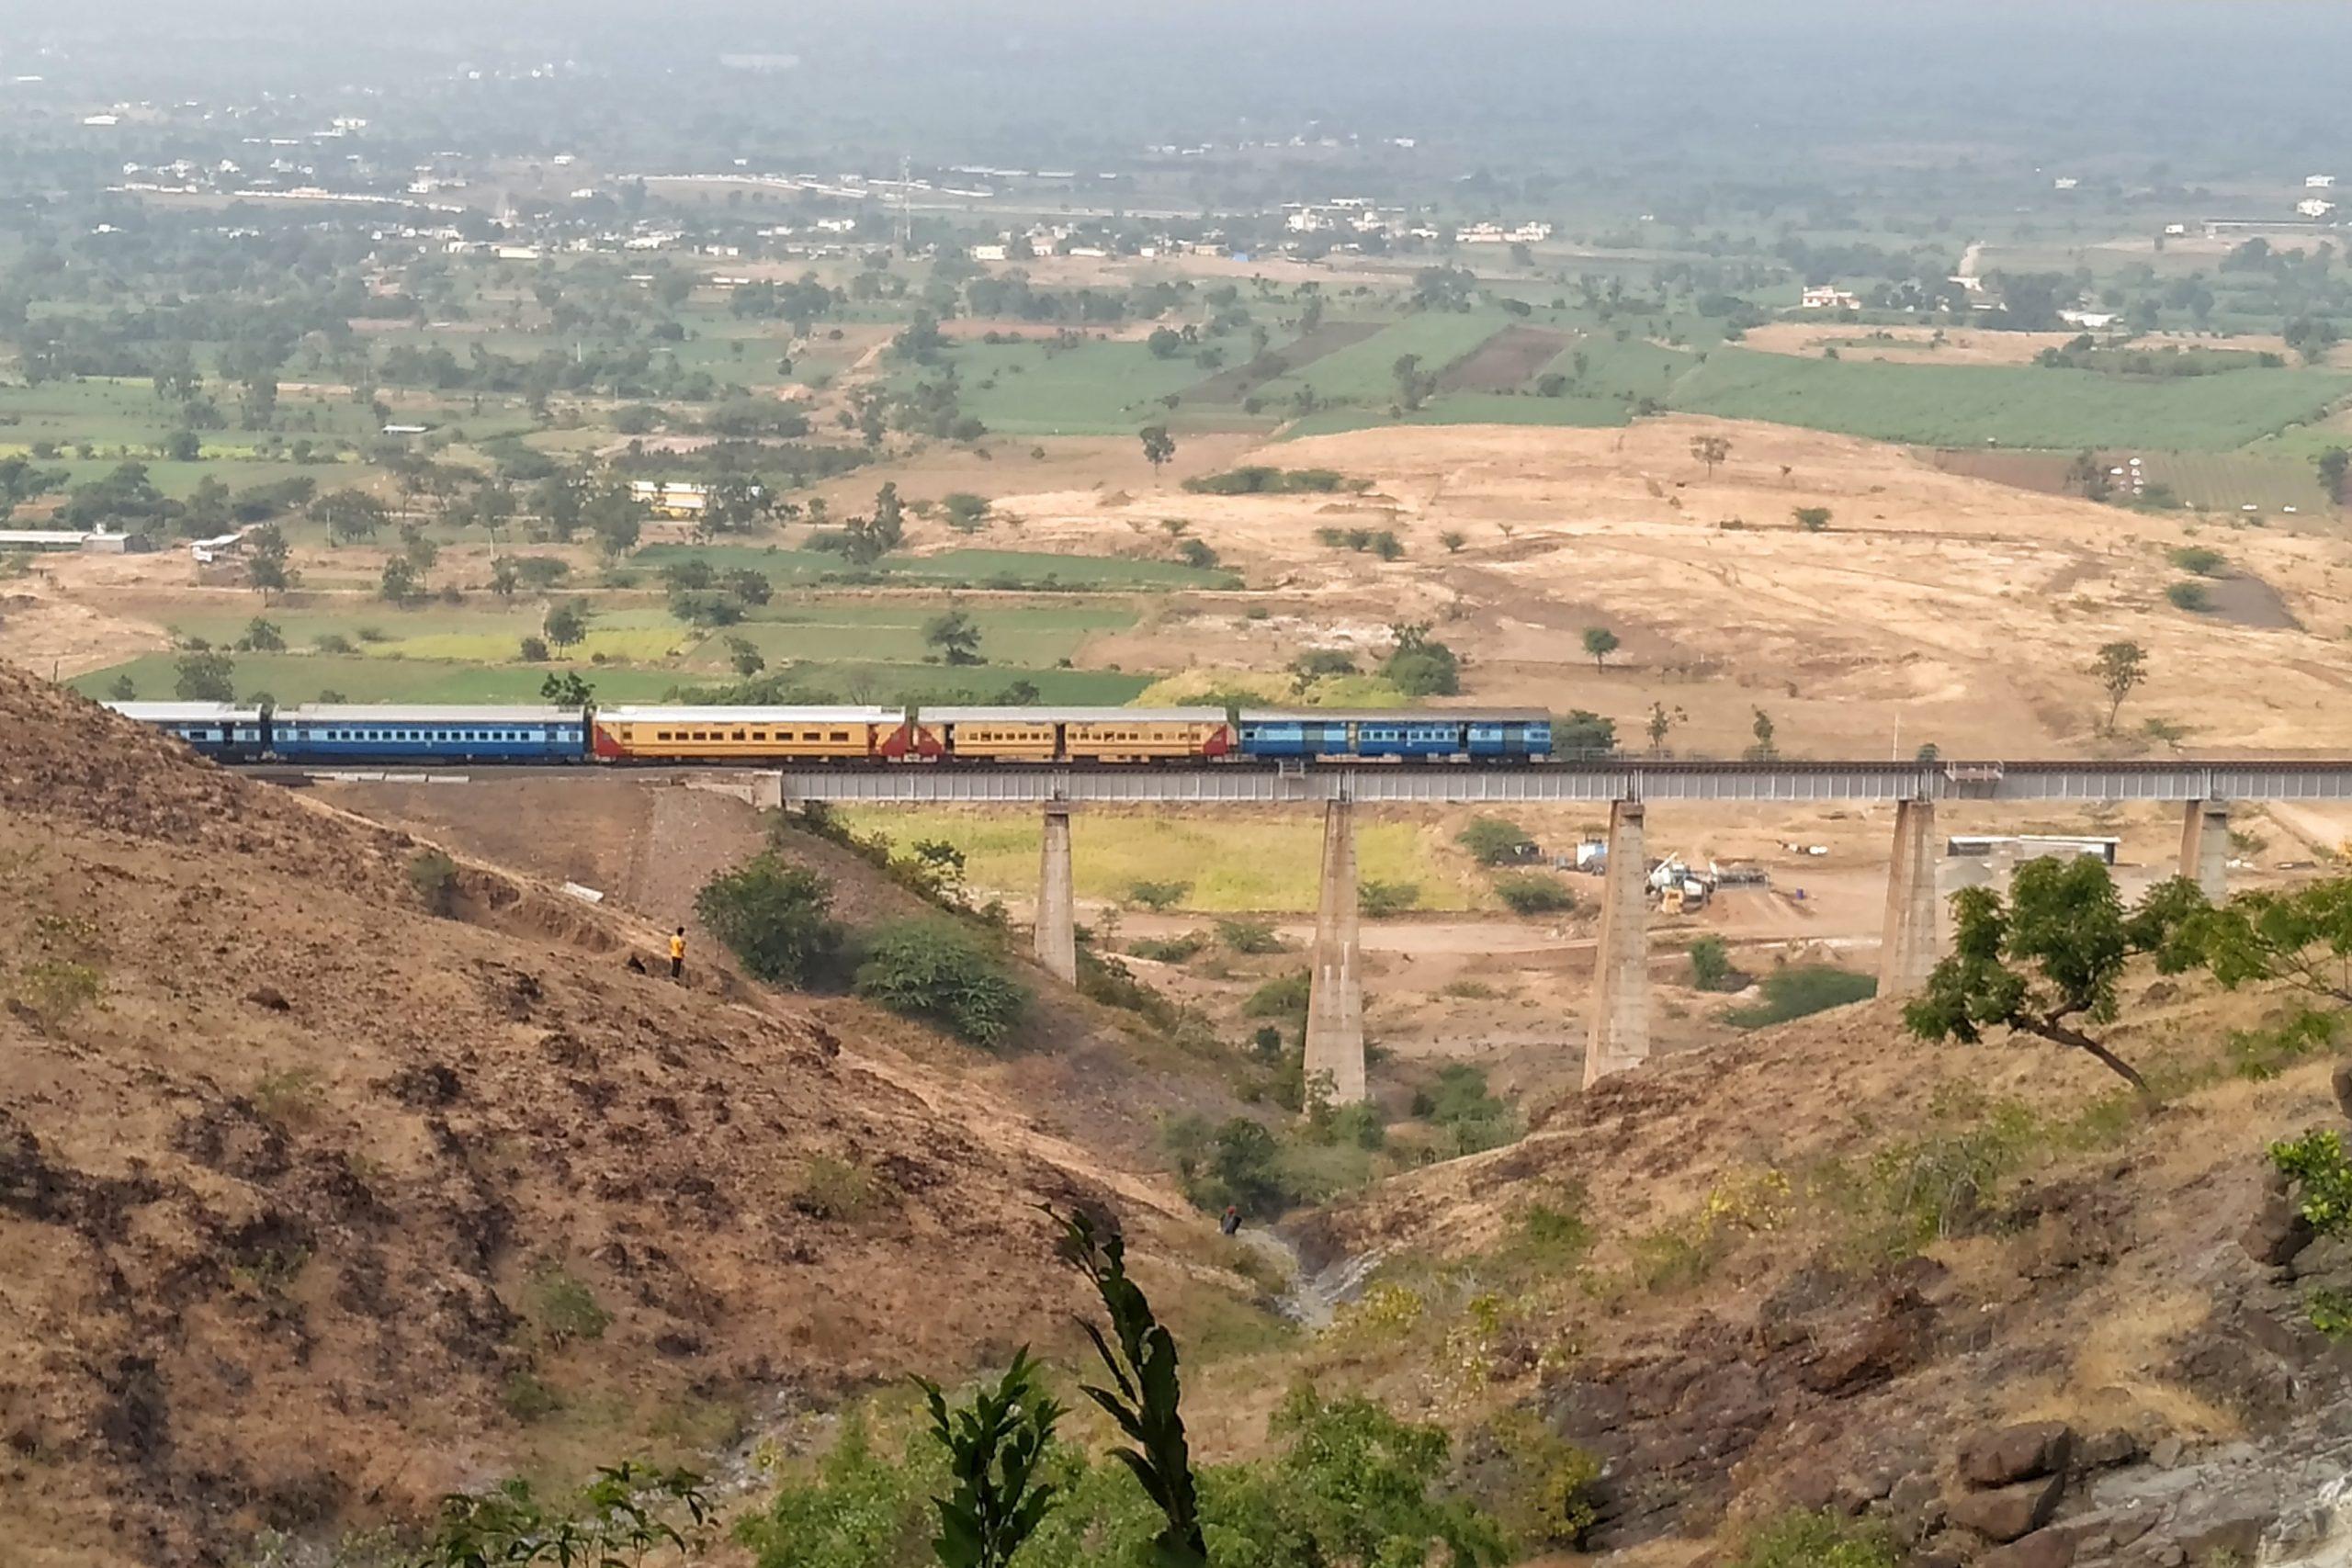 Transportation queen – Train over a bridge